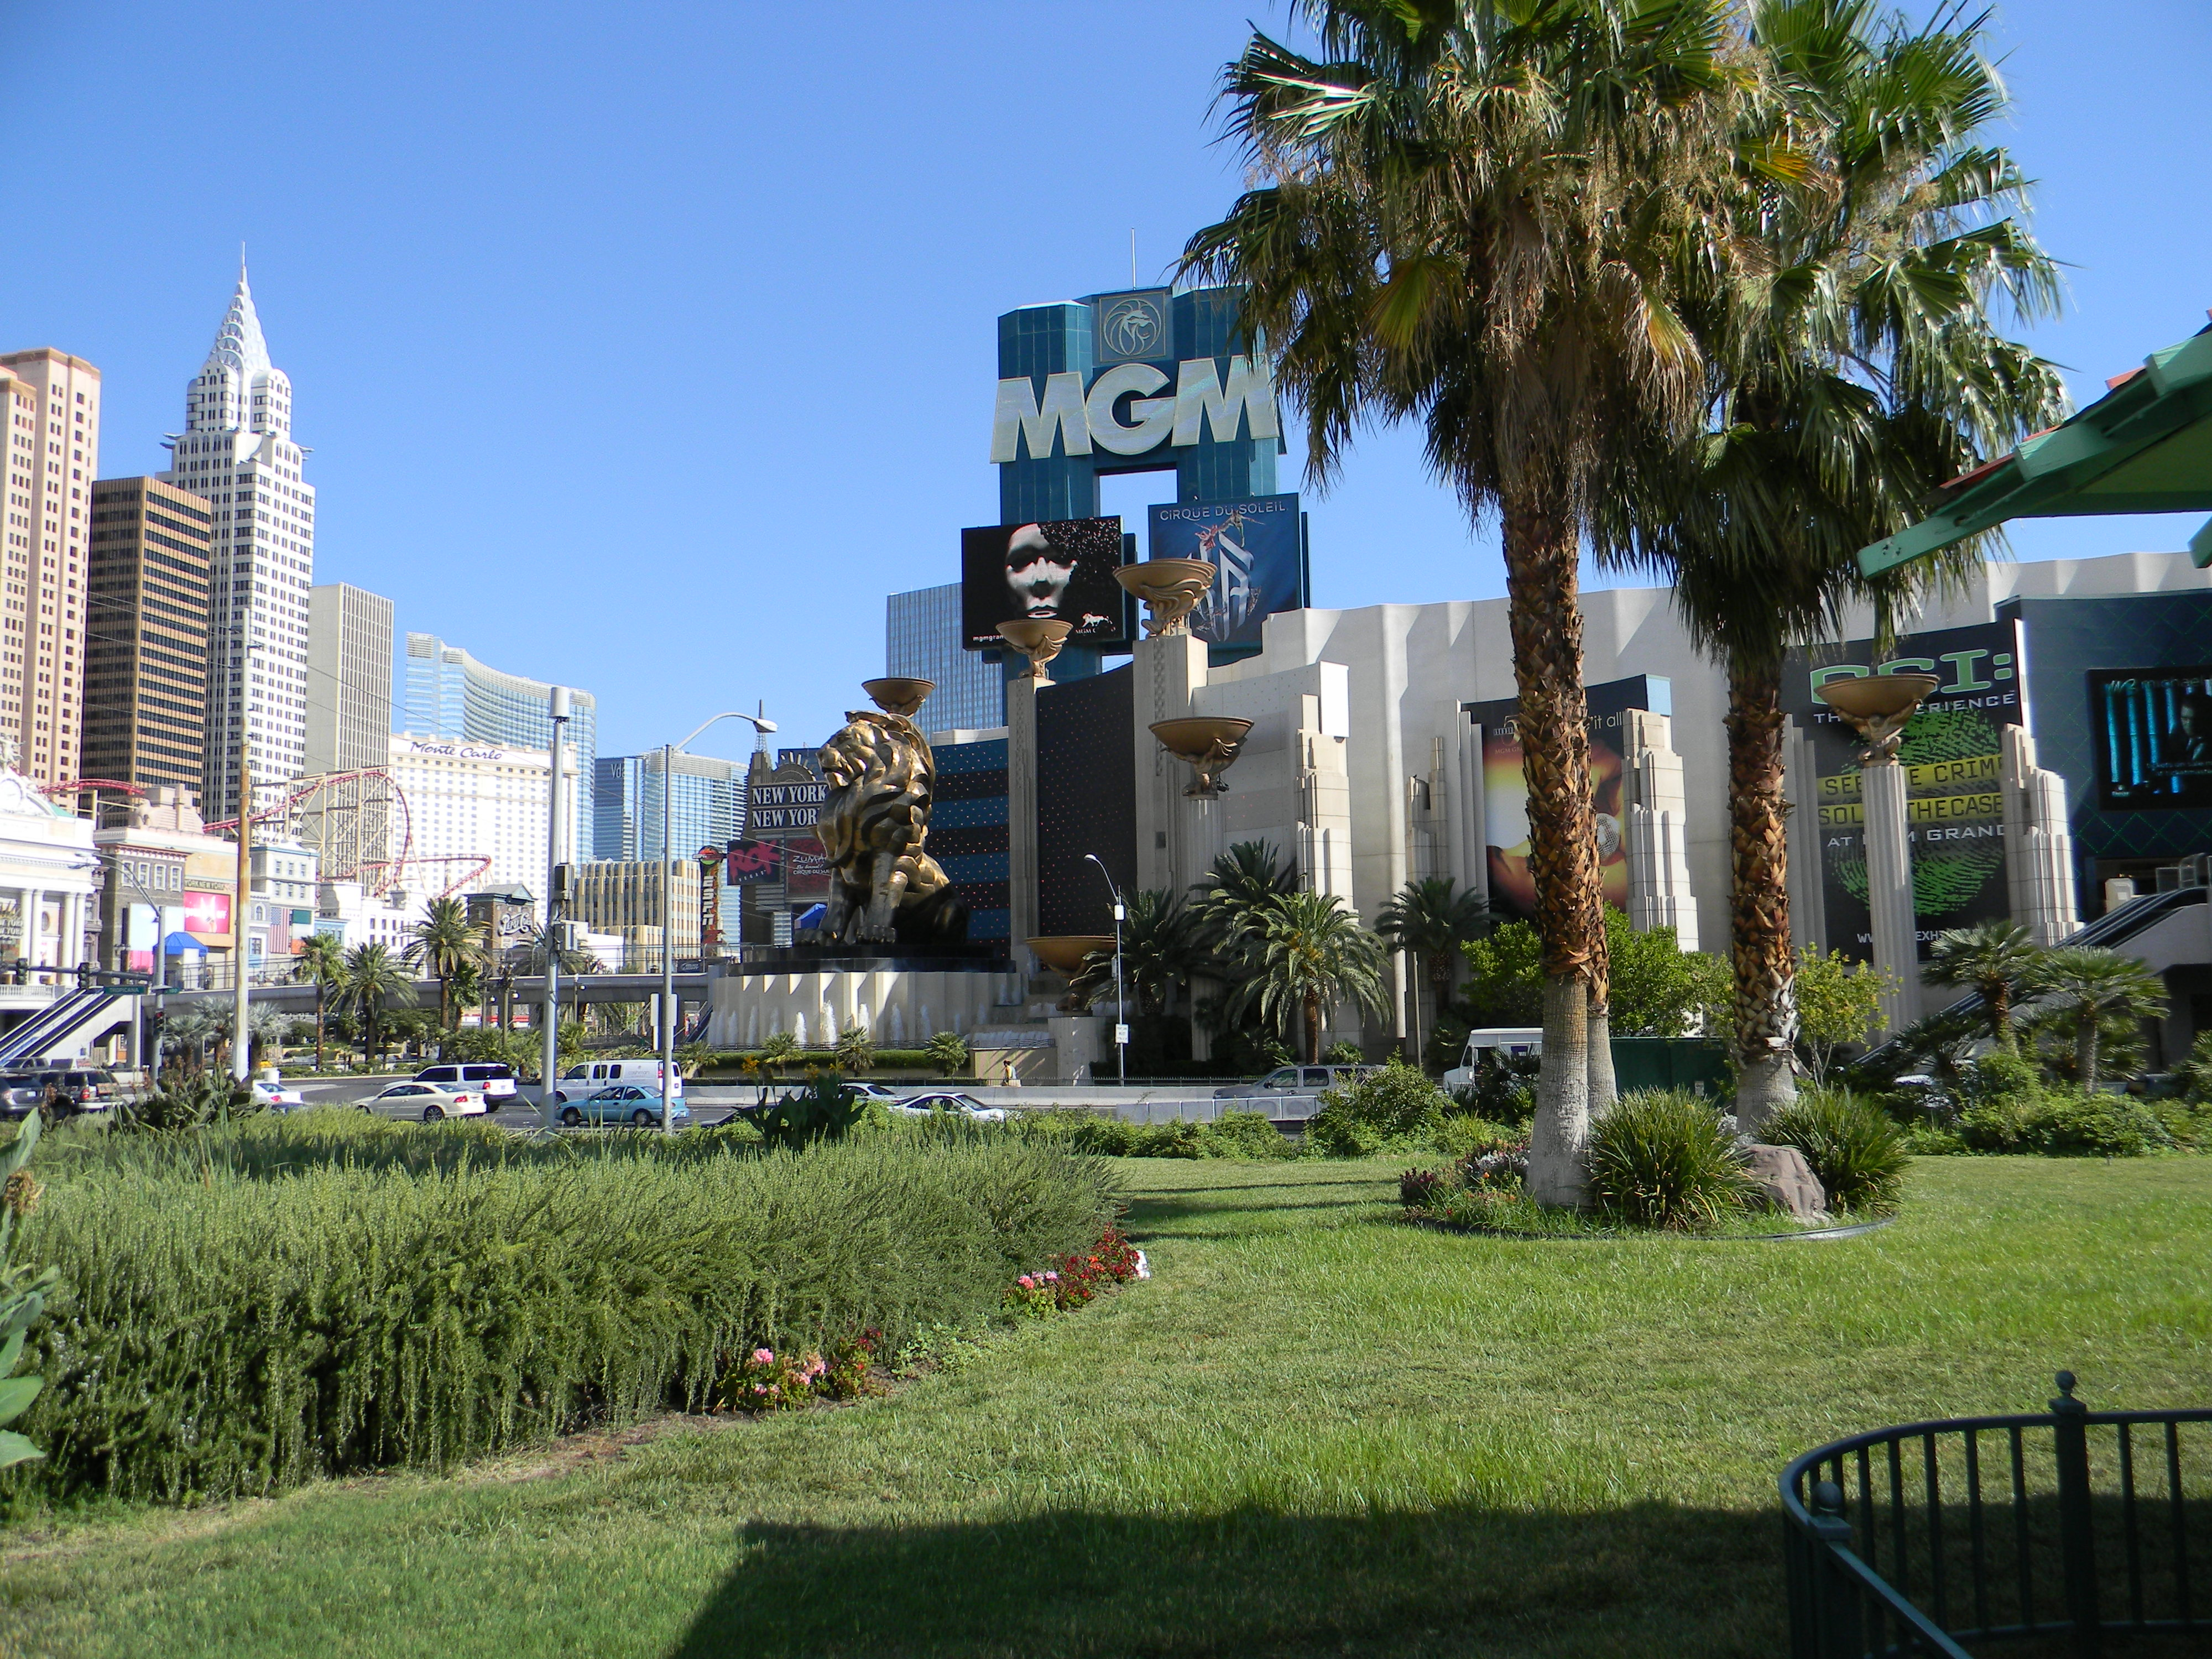 File Mgm Grand Hotel Las Vegas Entrance Lion Jpg Wikimedia Commons